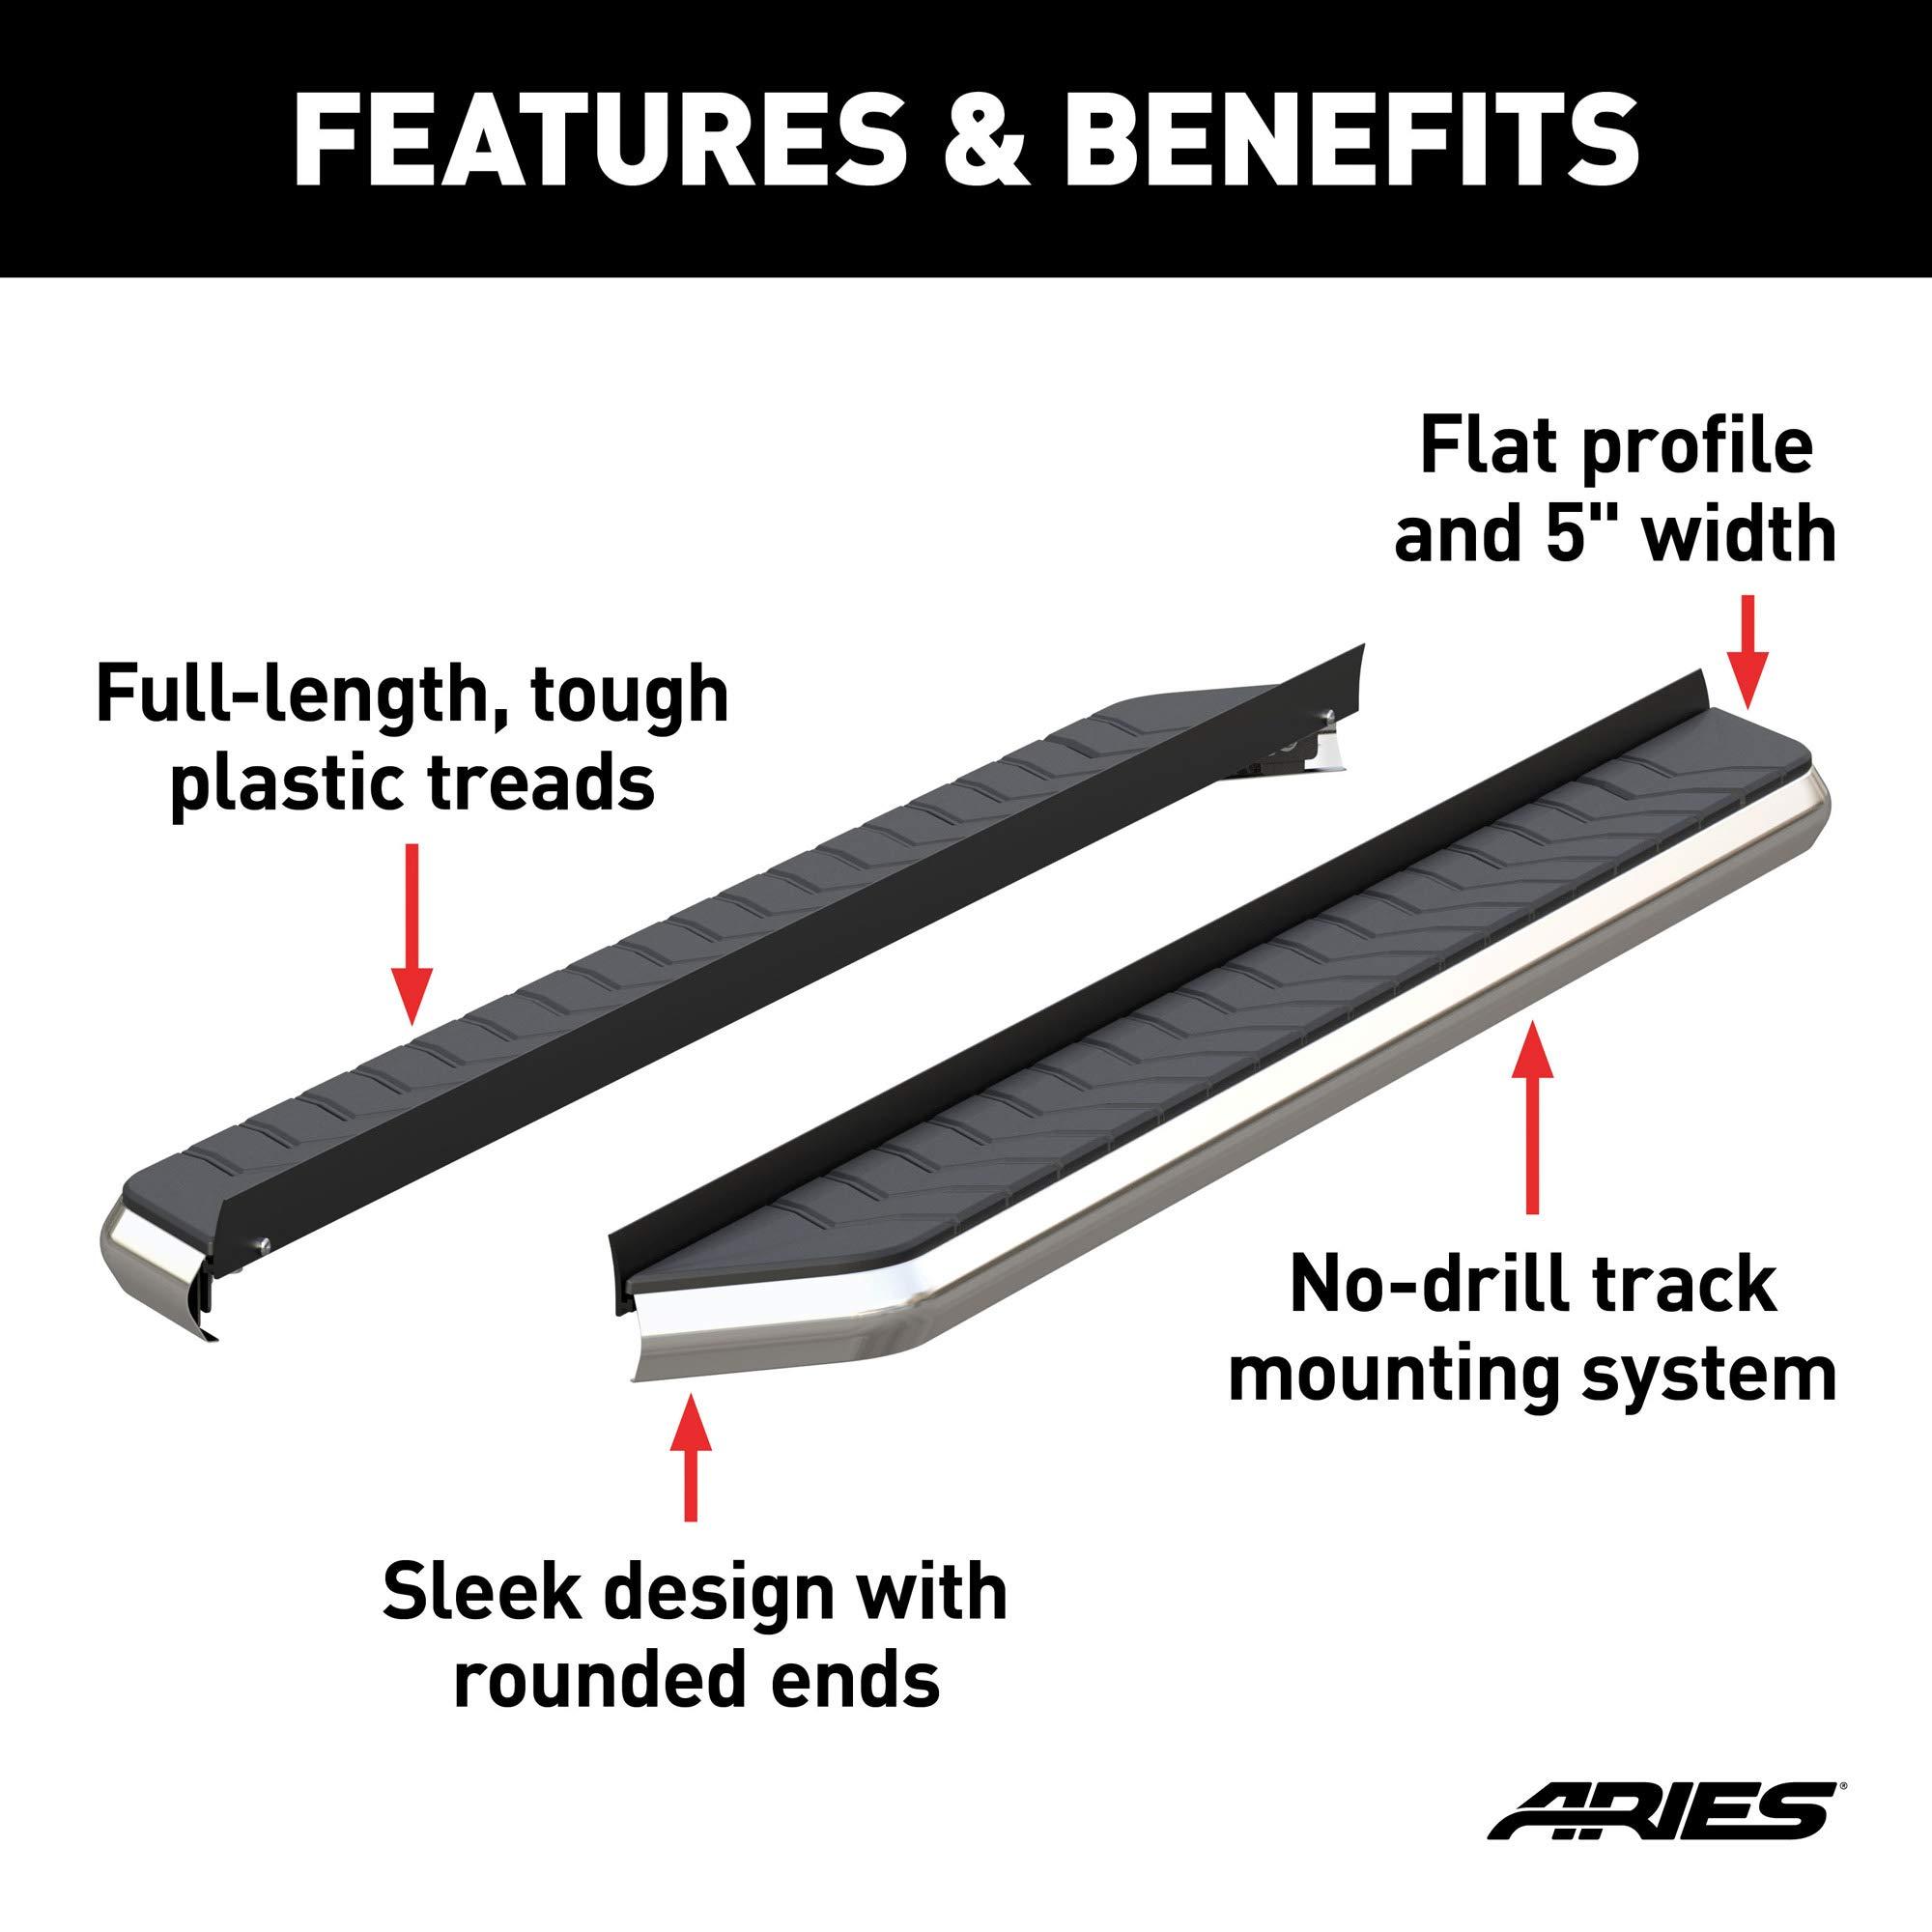 ARIES 2051011 5 AeroTread Running Board with Brackets